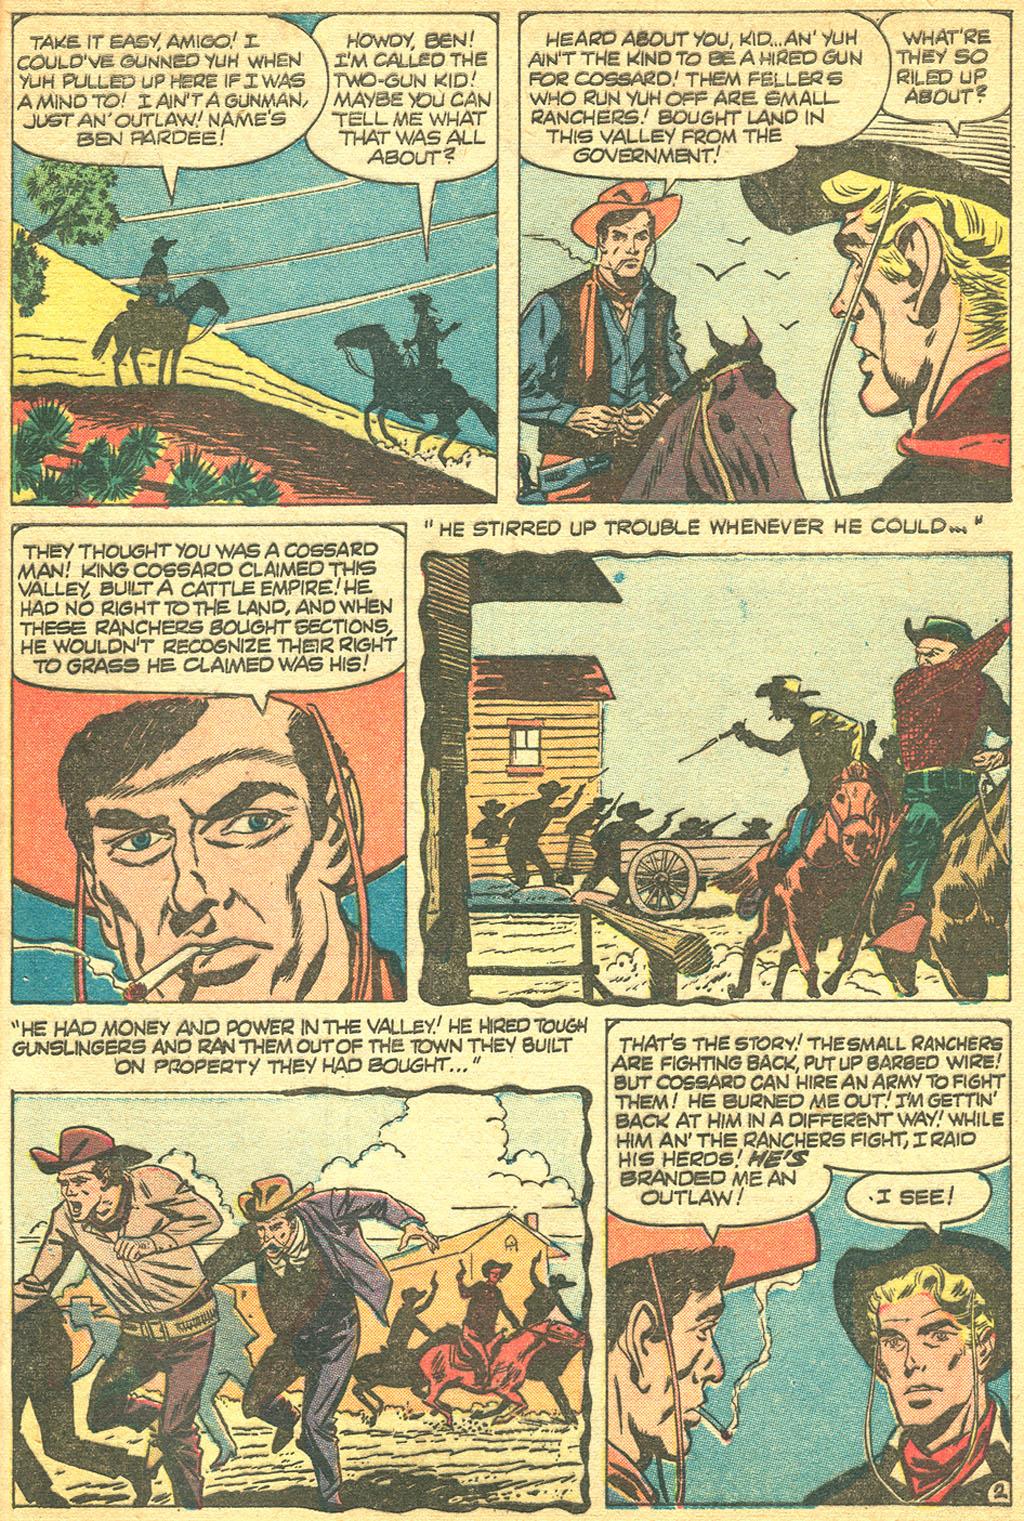 Read online Two-Gun Kid comic -  Issue #34 - 28